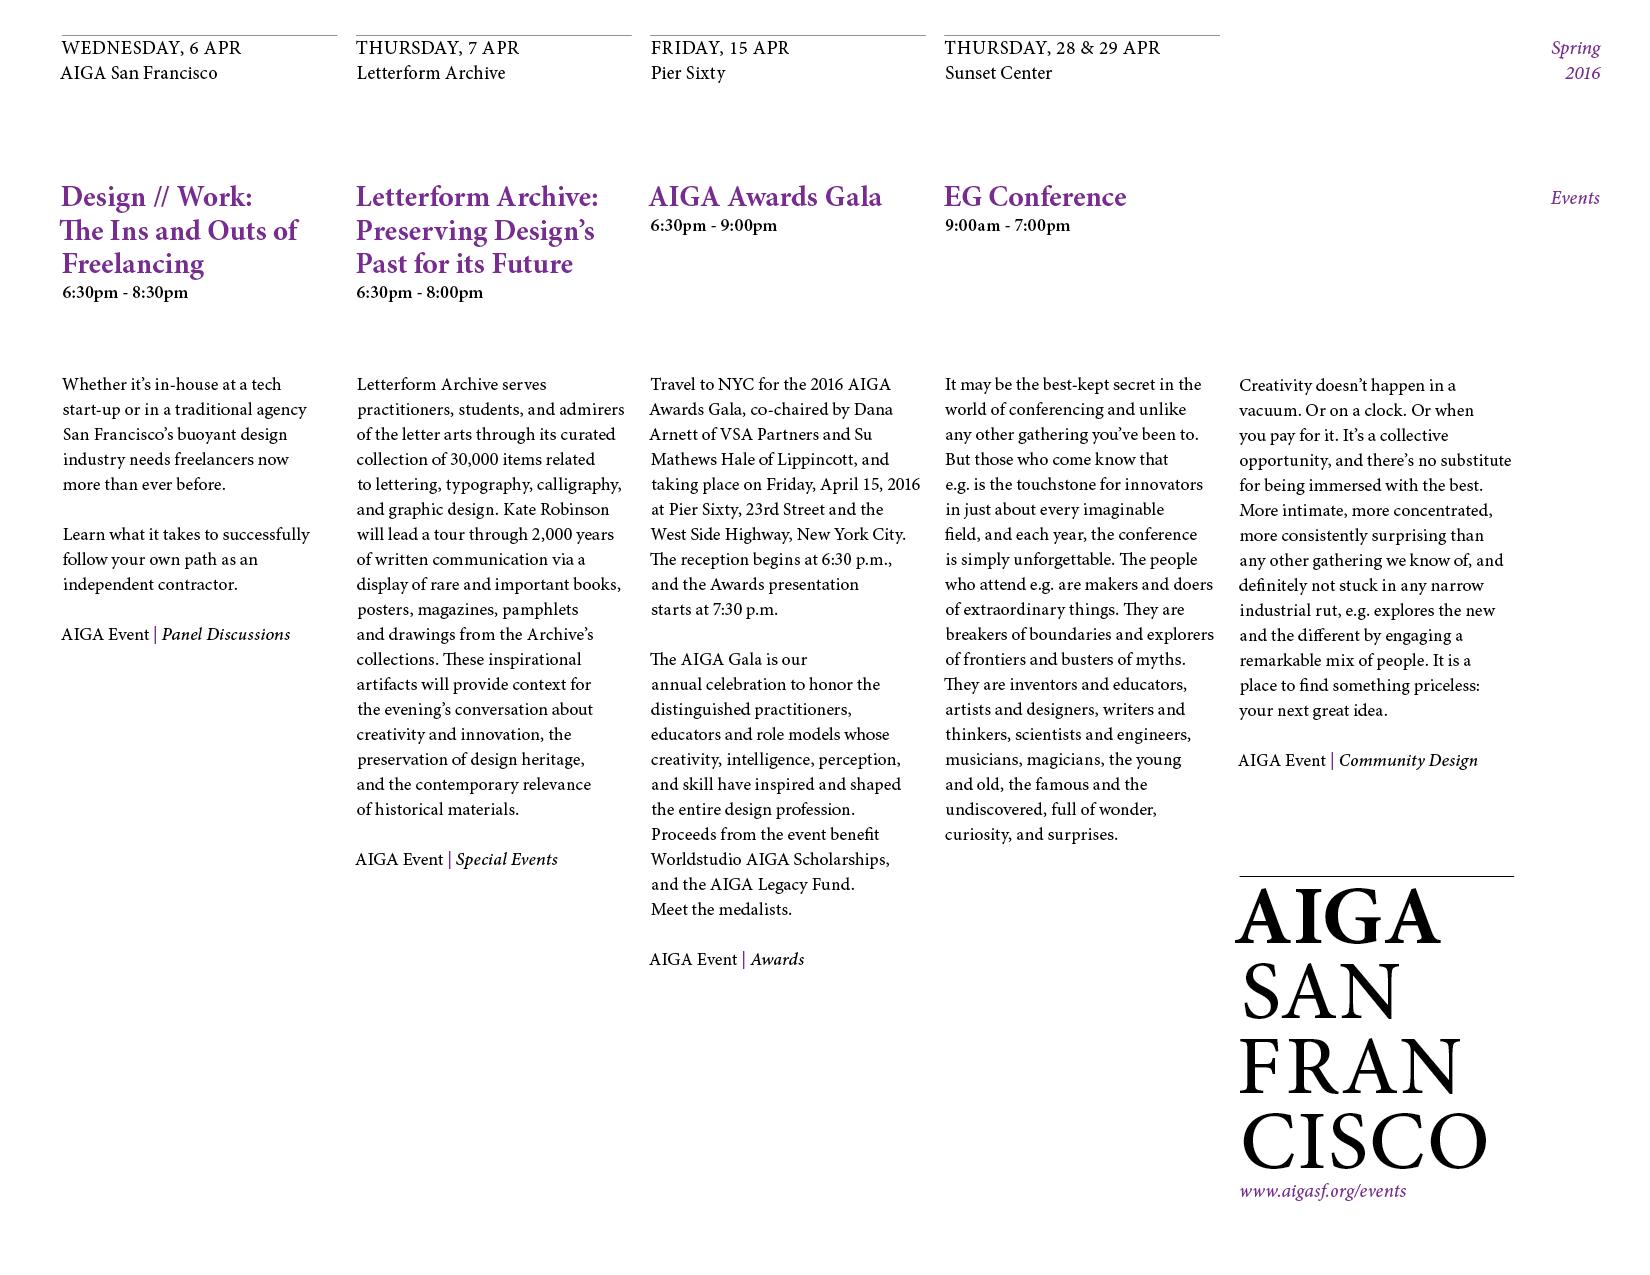 AIGA-calender-design-2016